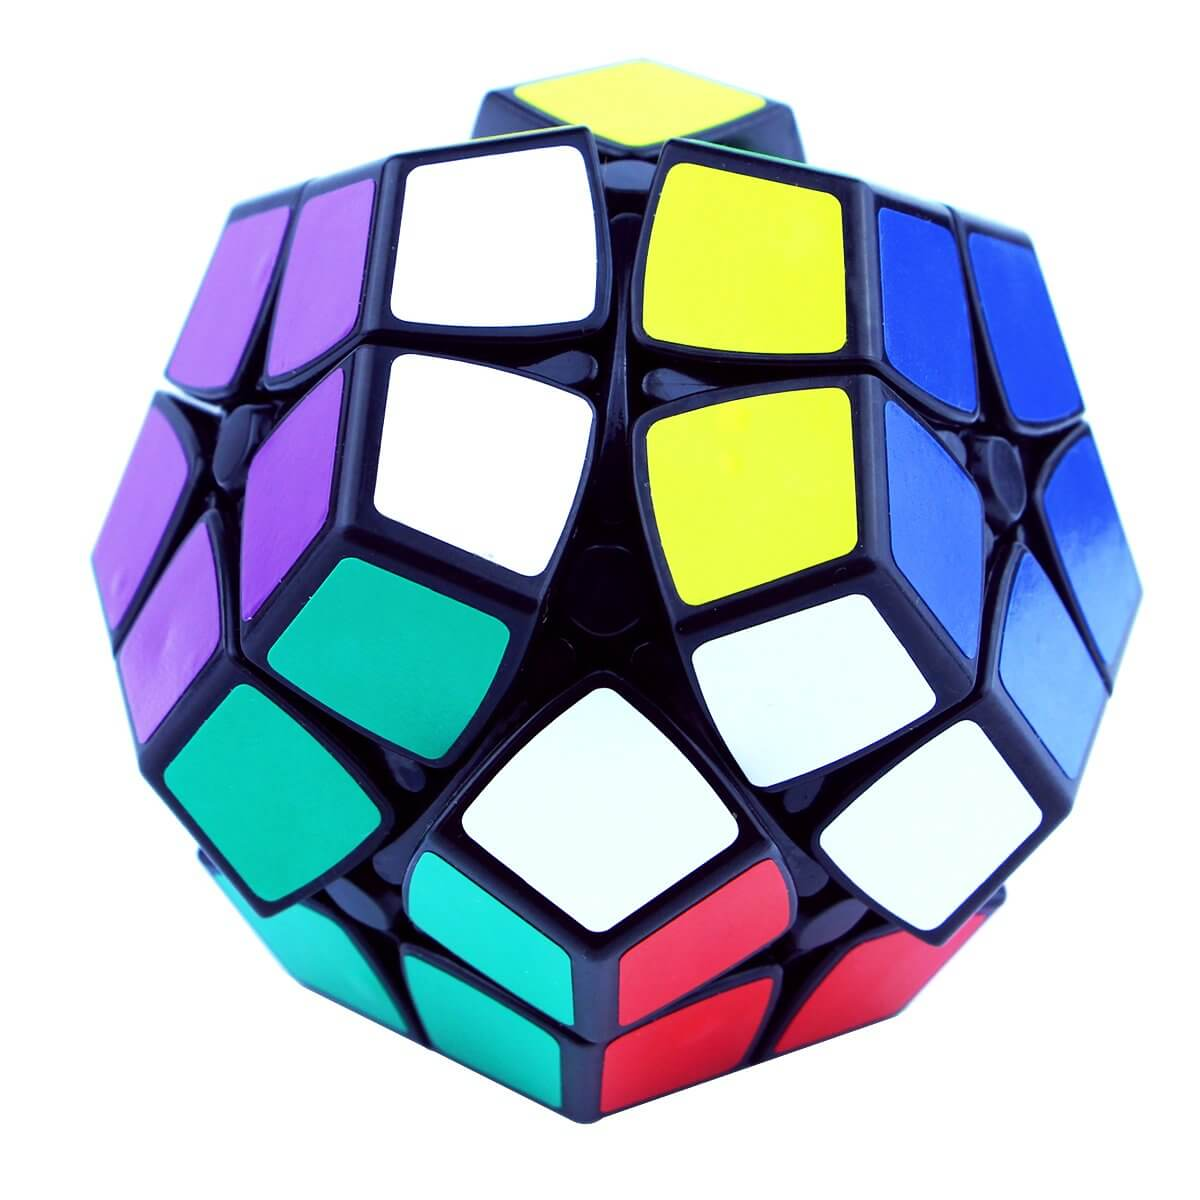 Trò chơi Rubik Megaminx 2x2 ShengShou BG3101